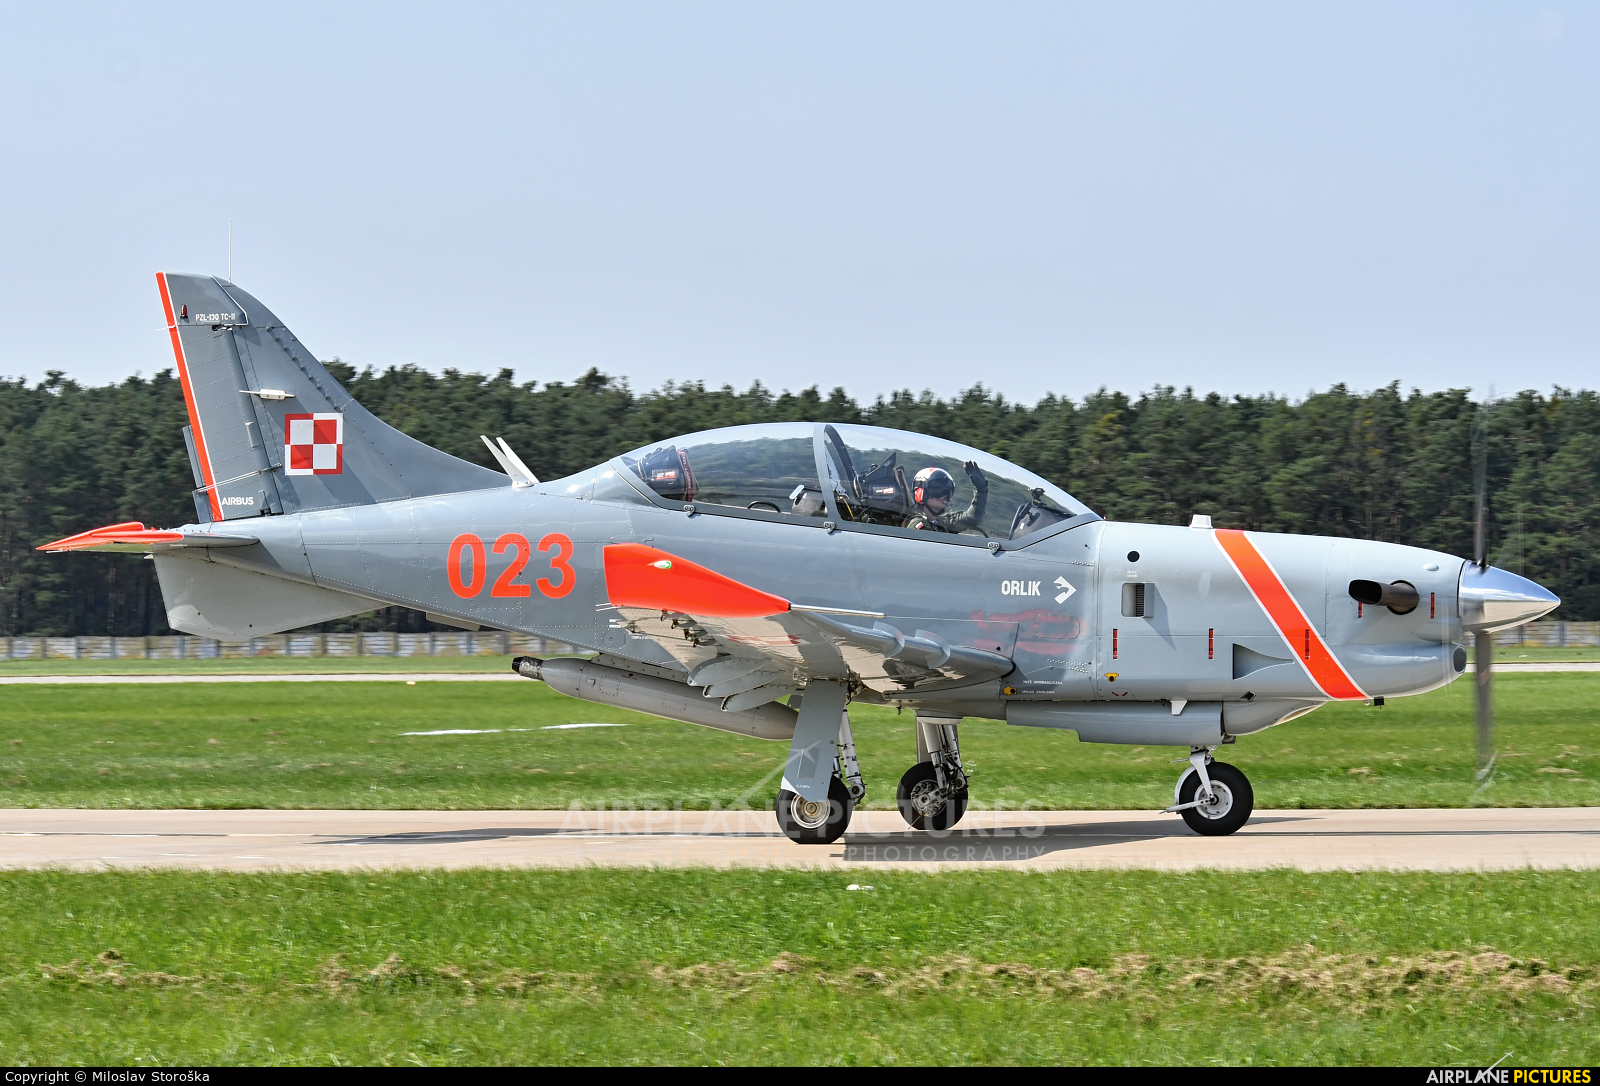 Poland - Air Force 023 aircraft at Malacky - Kuchyna